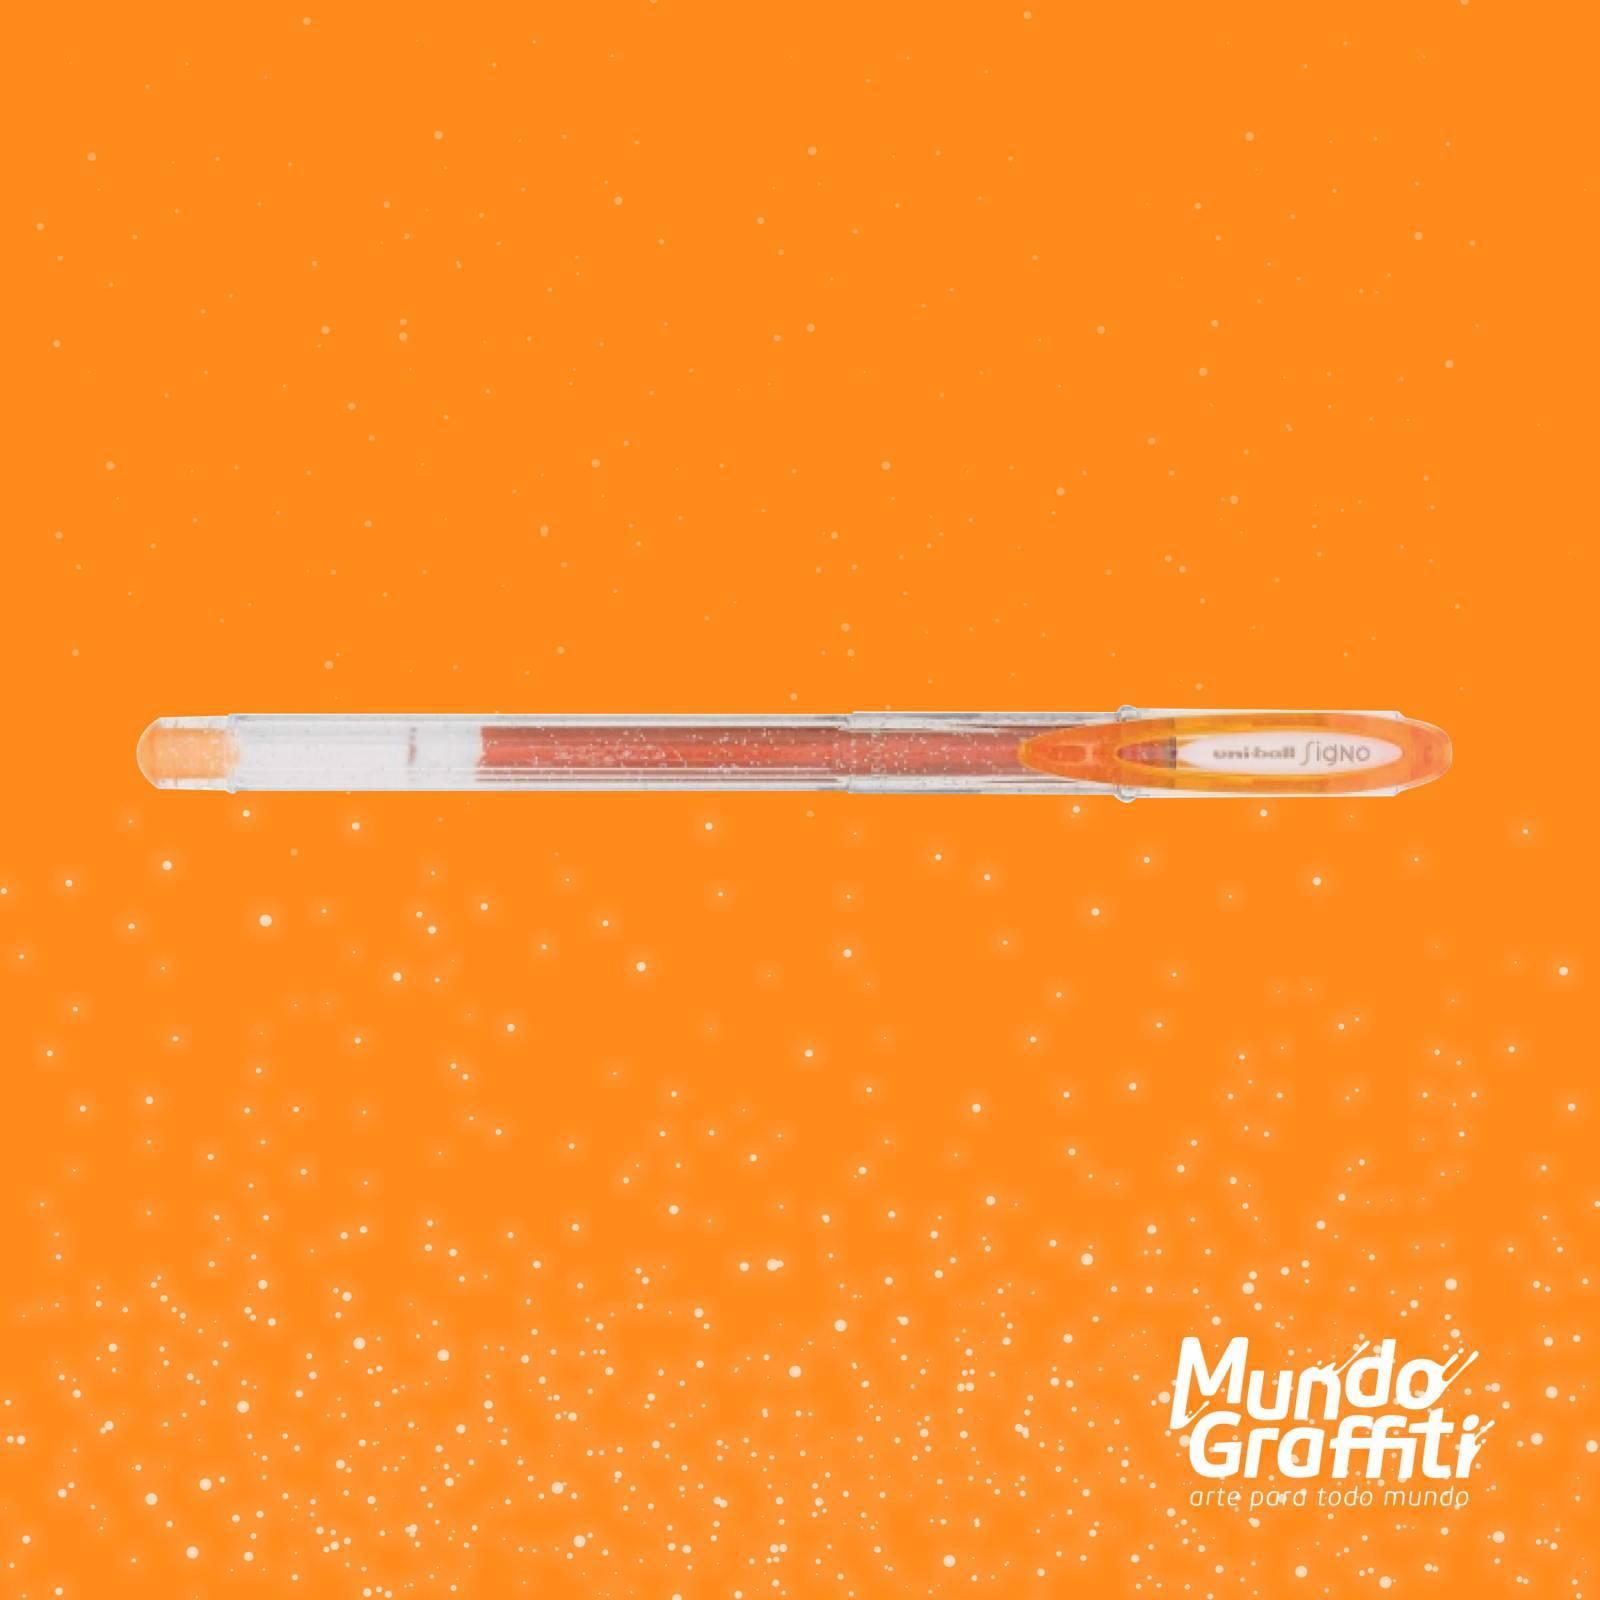 Caneta Signo Gel Sparkling Glitter Laranja 0,7mm - Mundo Graffiti